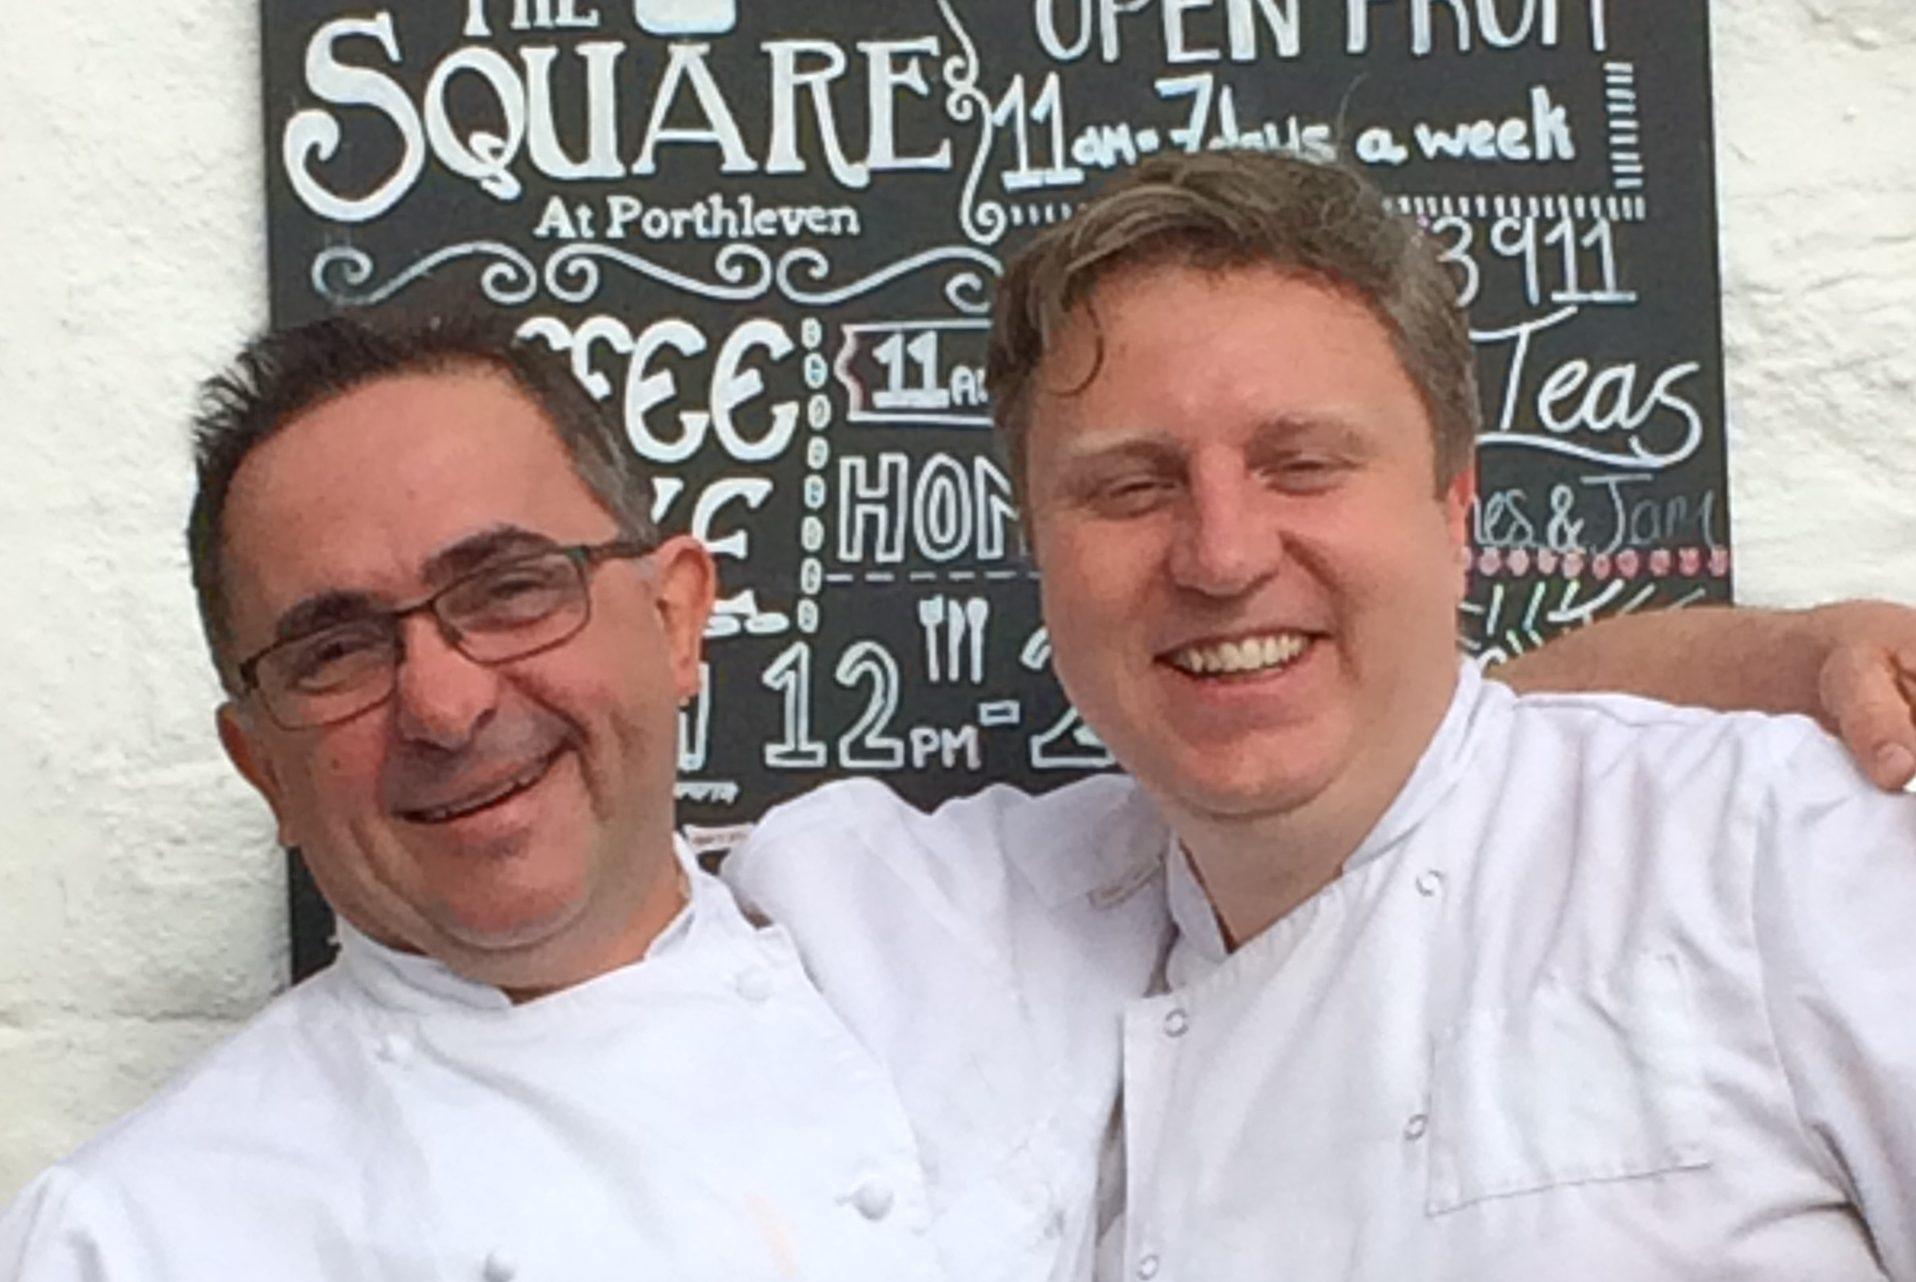 Stew Eddy & Bryok Williams – The Square